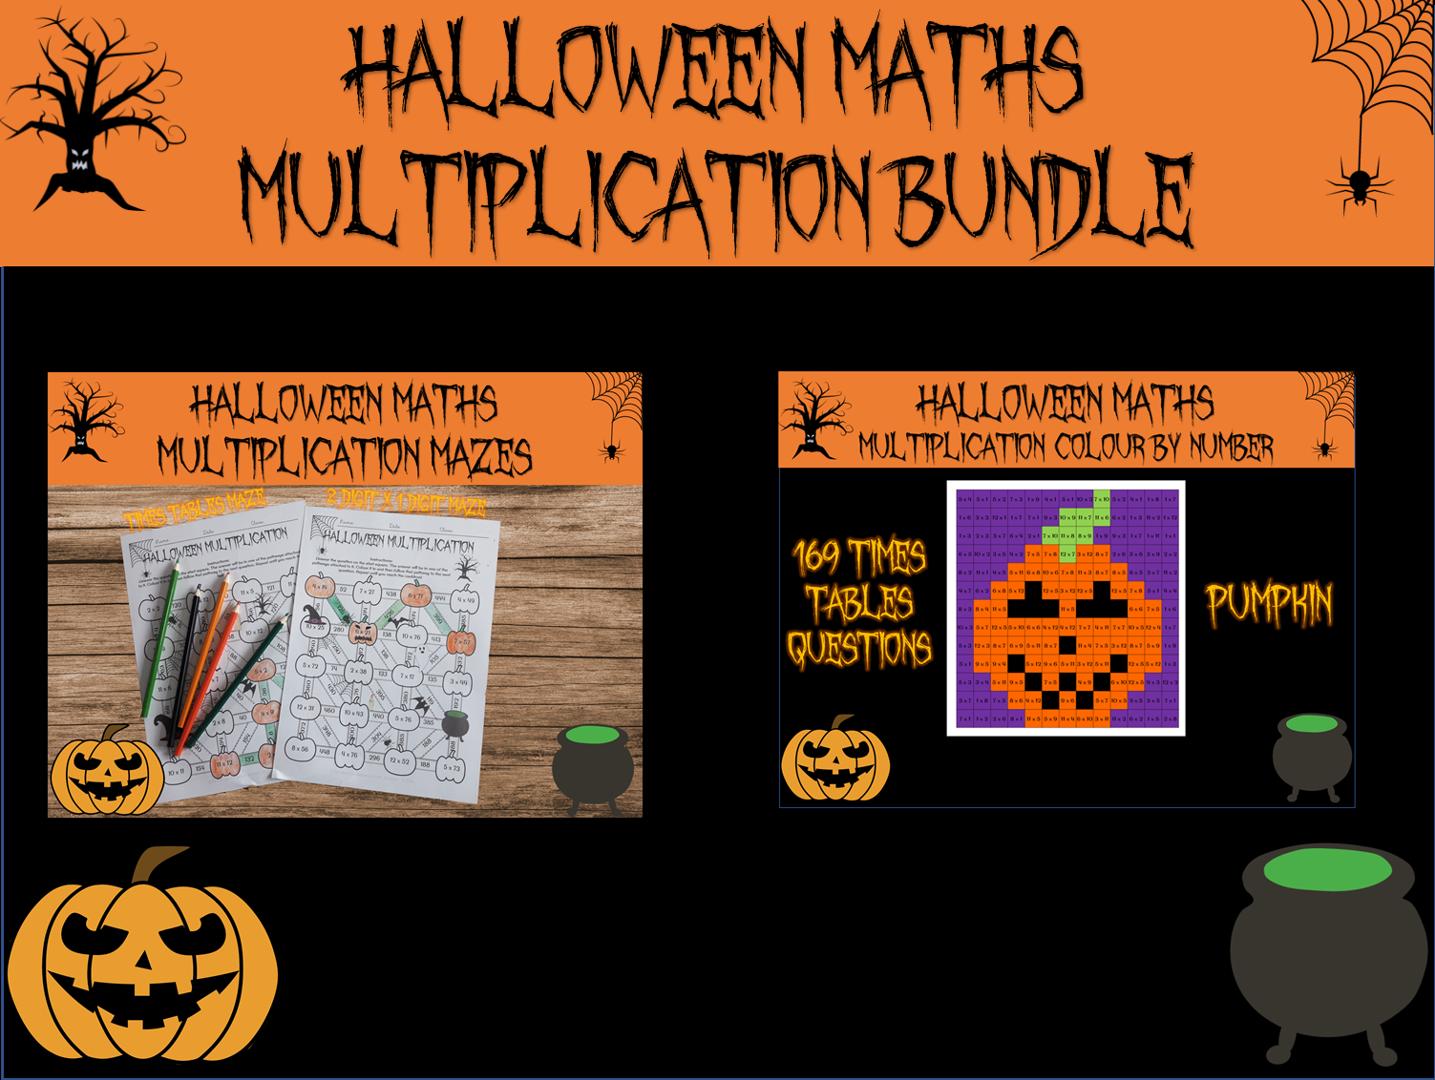 Halloween Maths Multiplication Activities Bundle